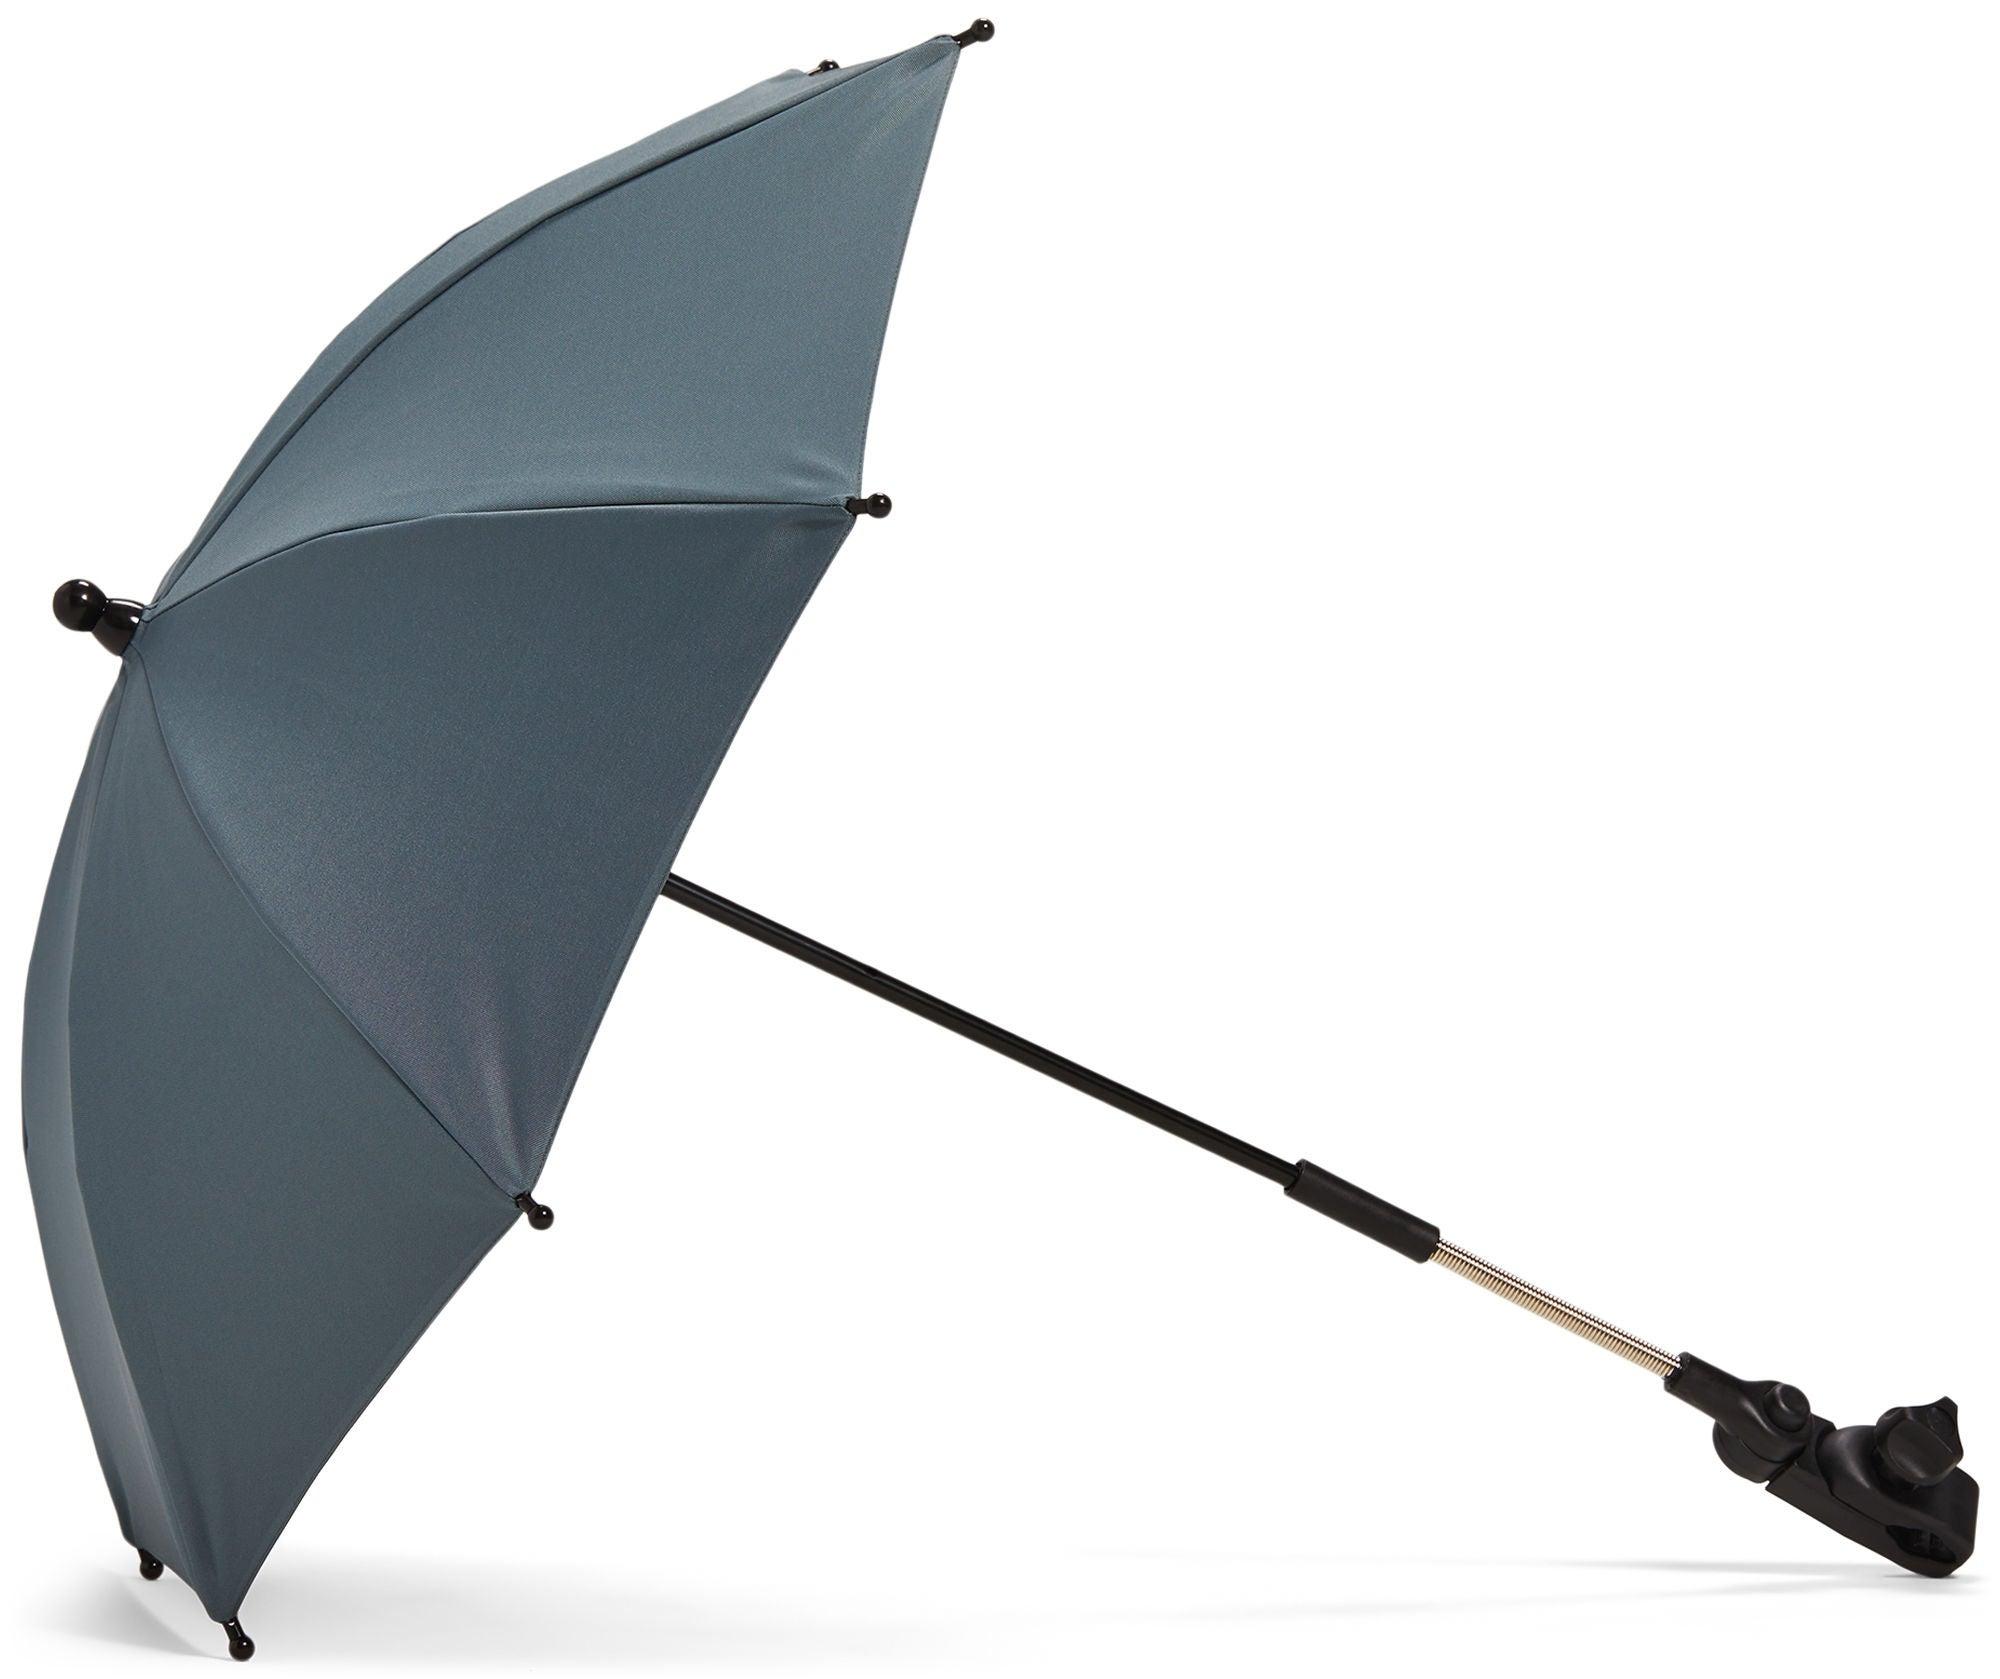 Beemoo Aurinkovarjo Lastenvaunuihin, Stormy Weather